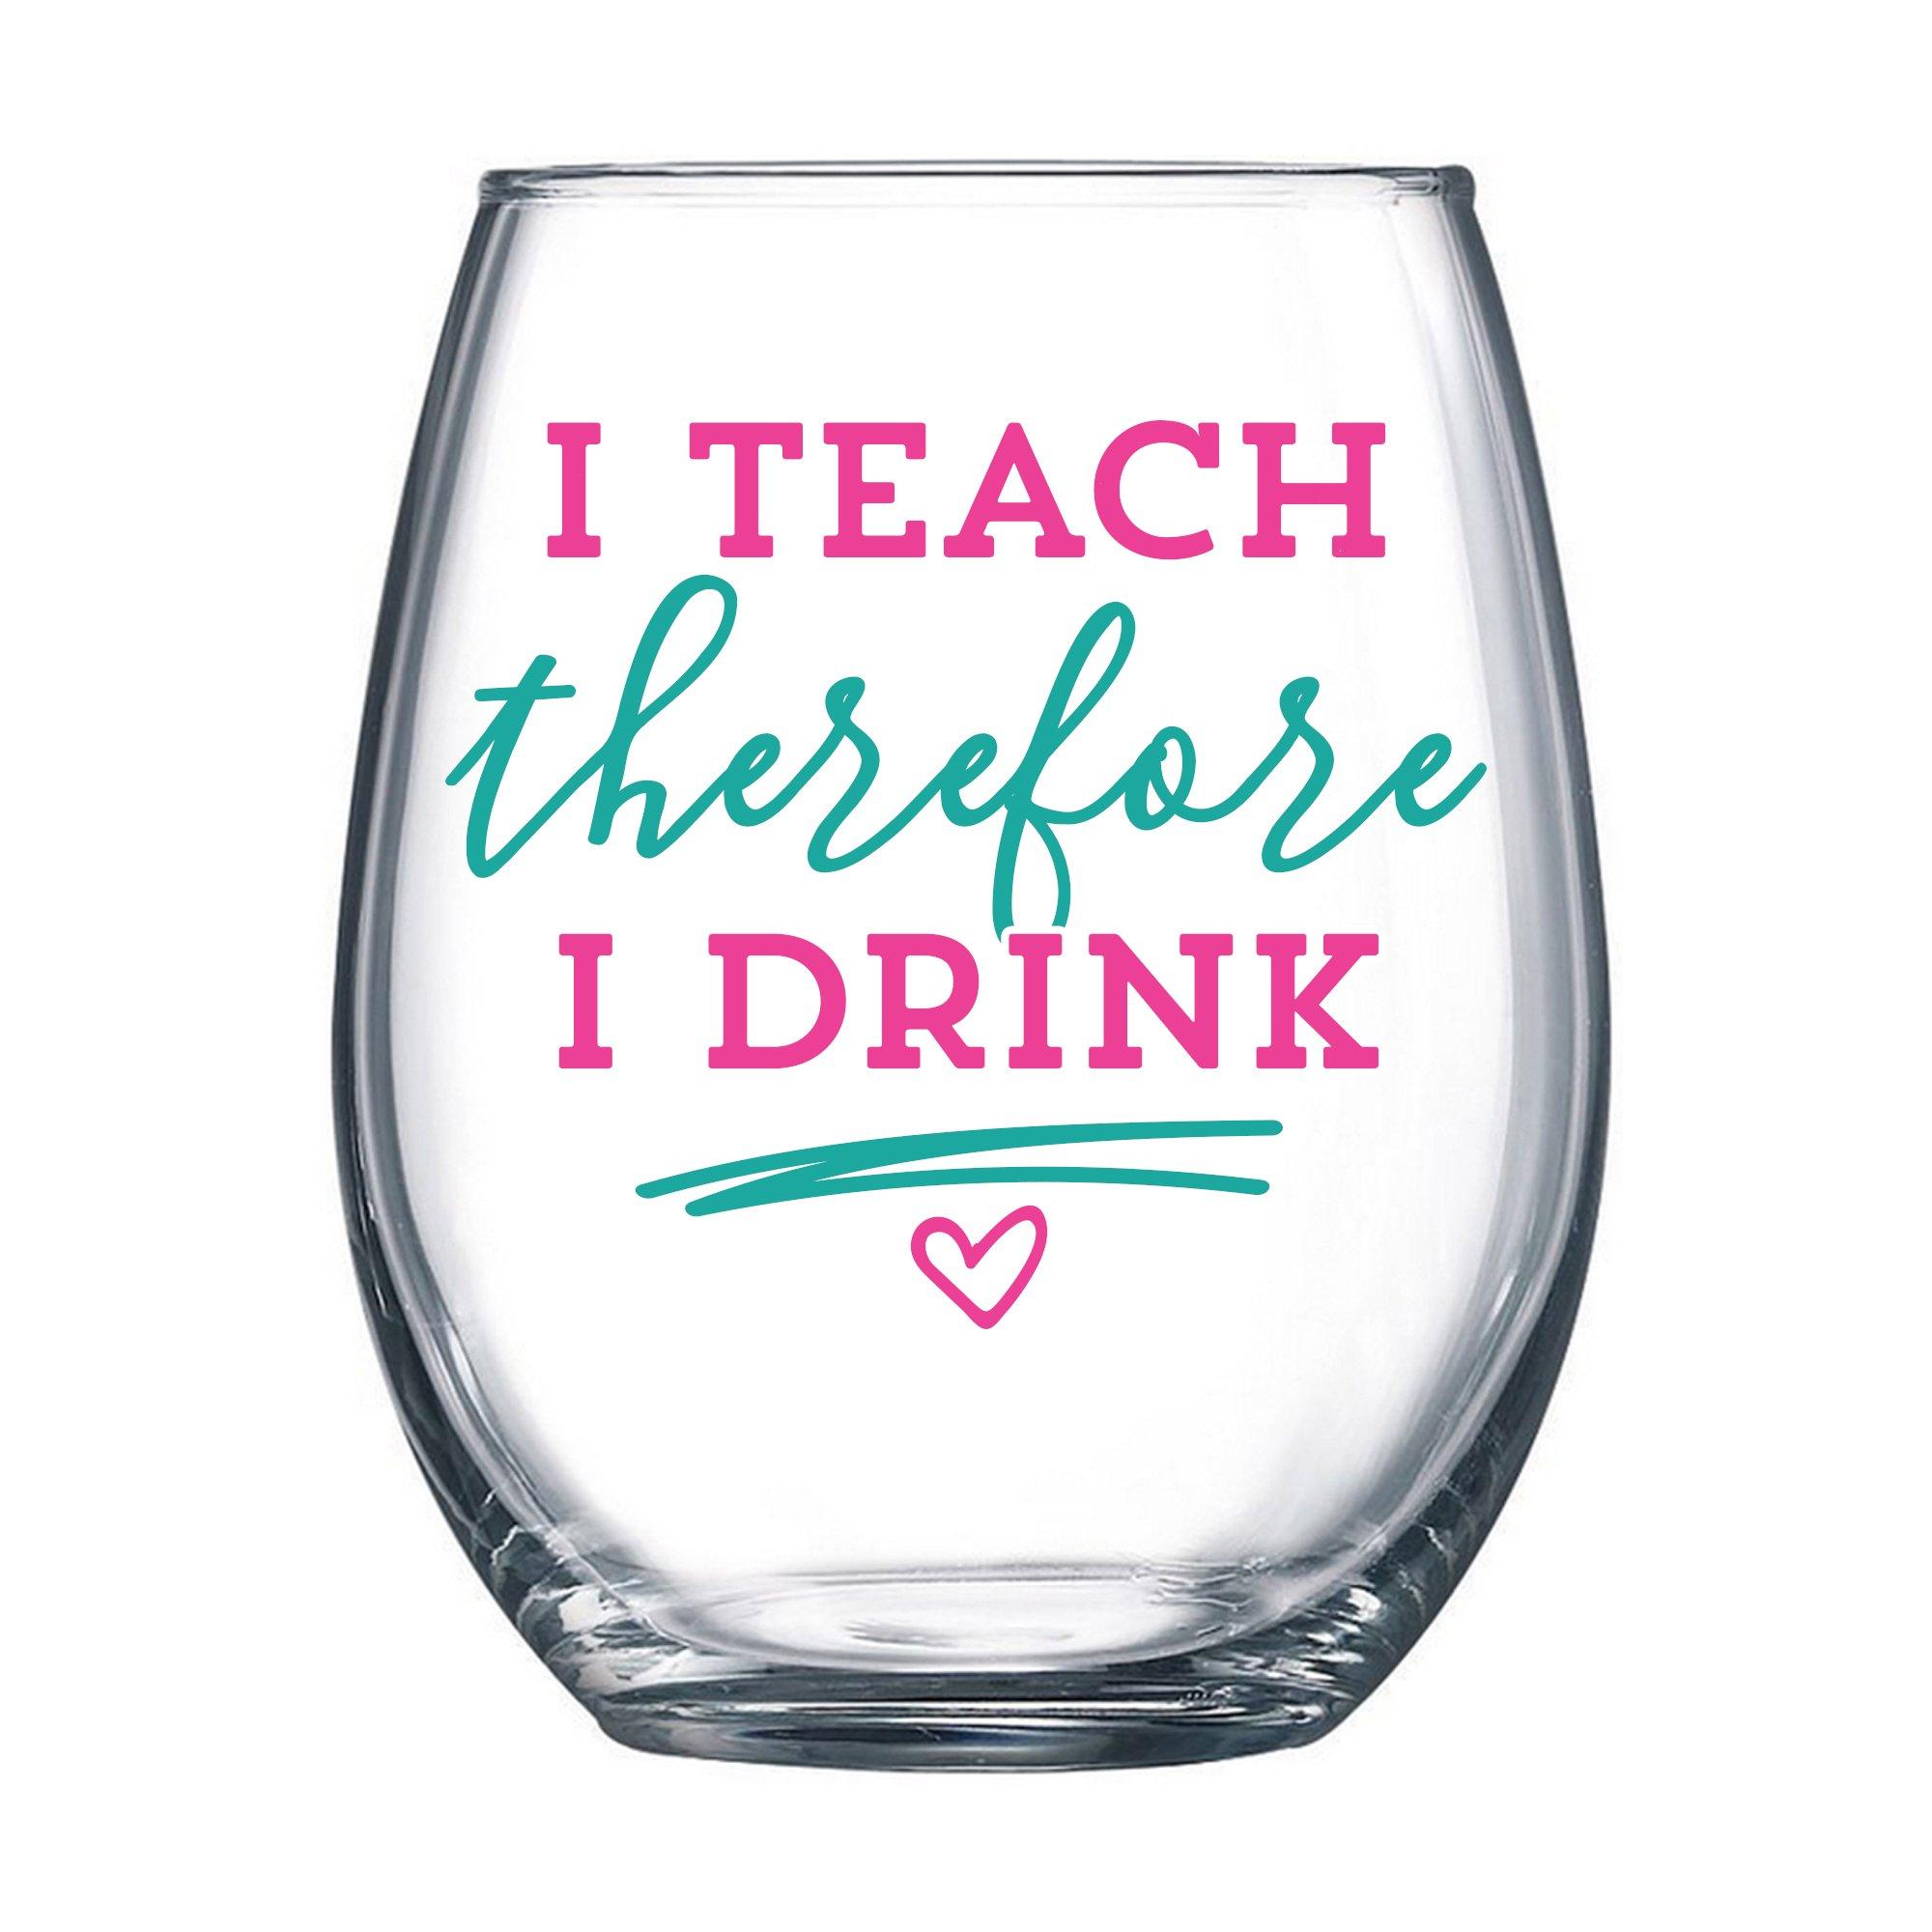 Funny Teacher Wine Glass - I Teach Therefore I Drink - 17 oz Stemless Wine Glass (aqua/pink imprint)